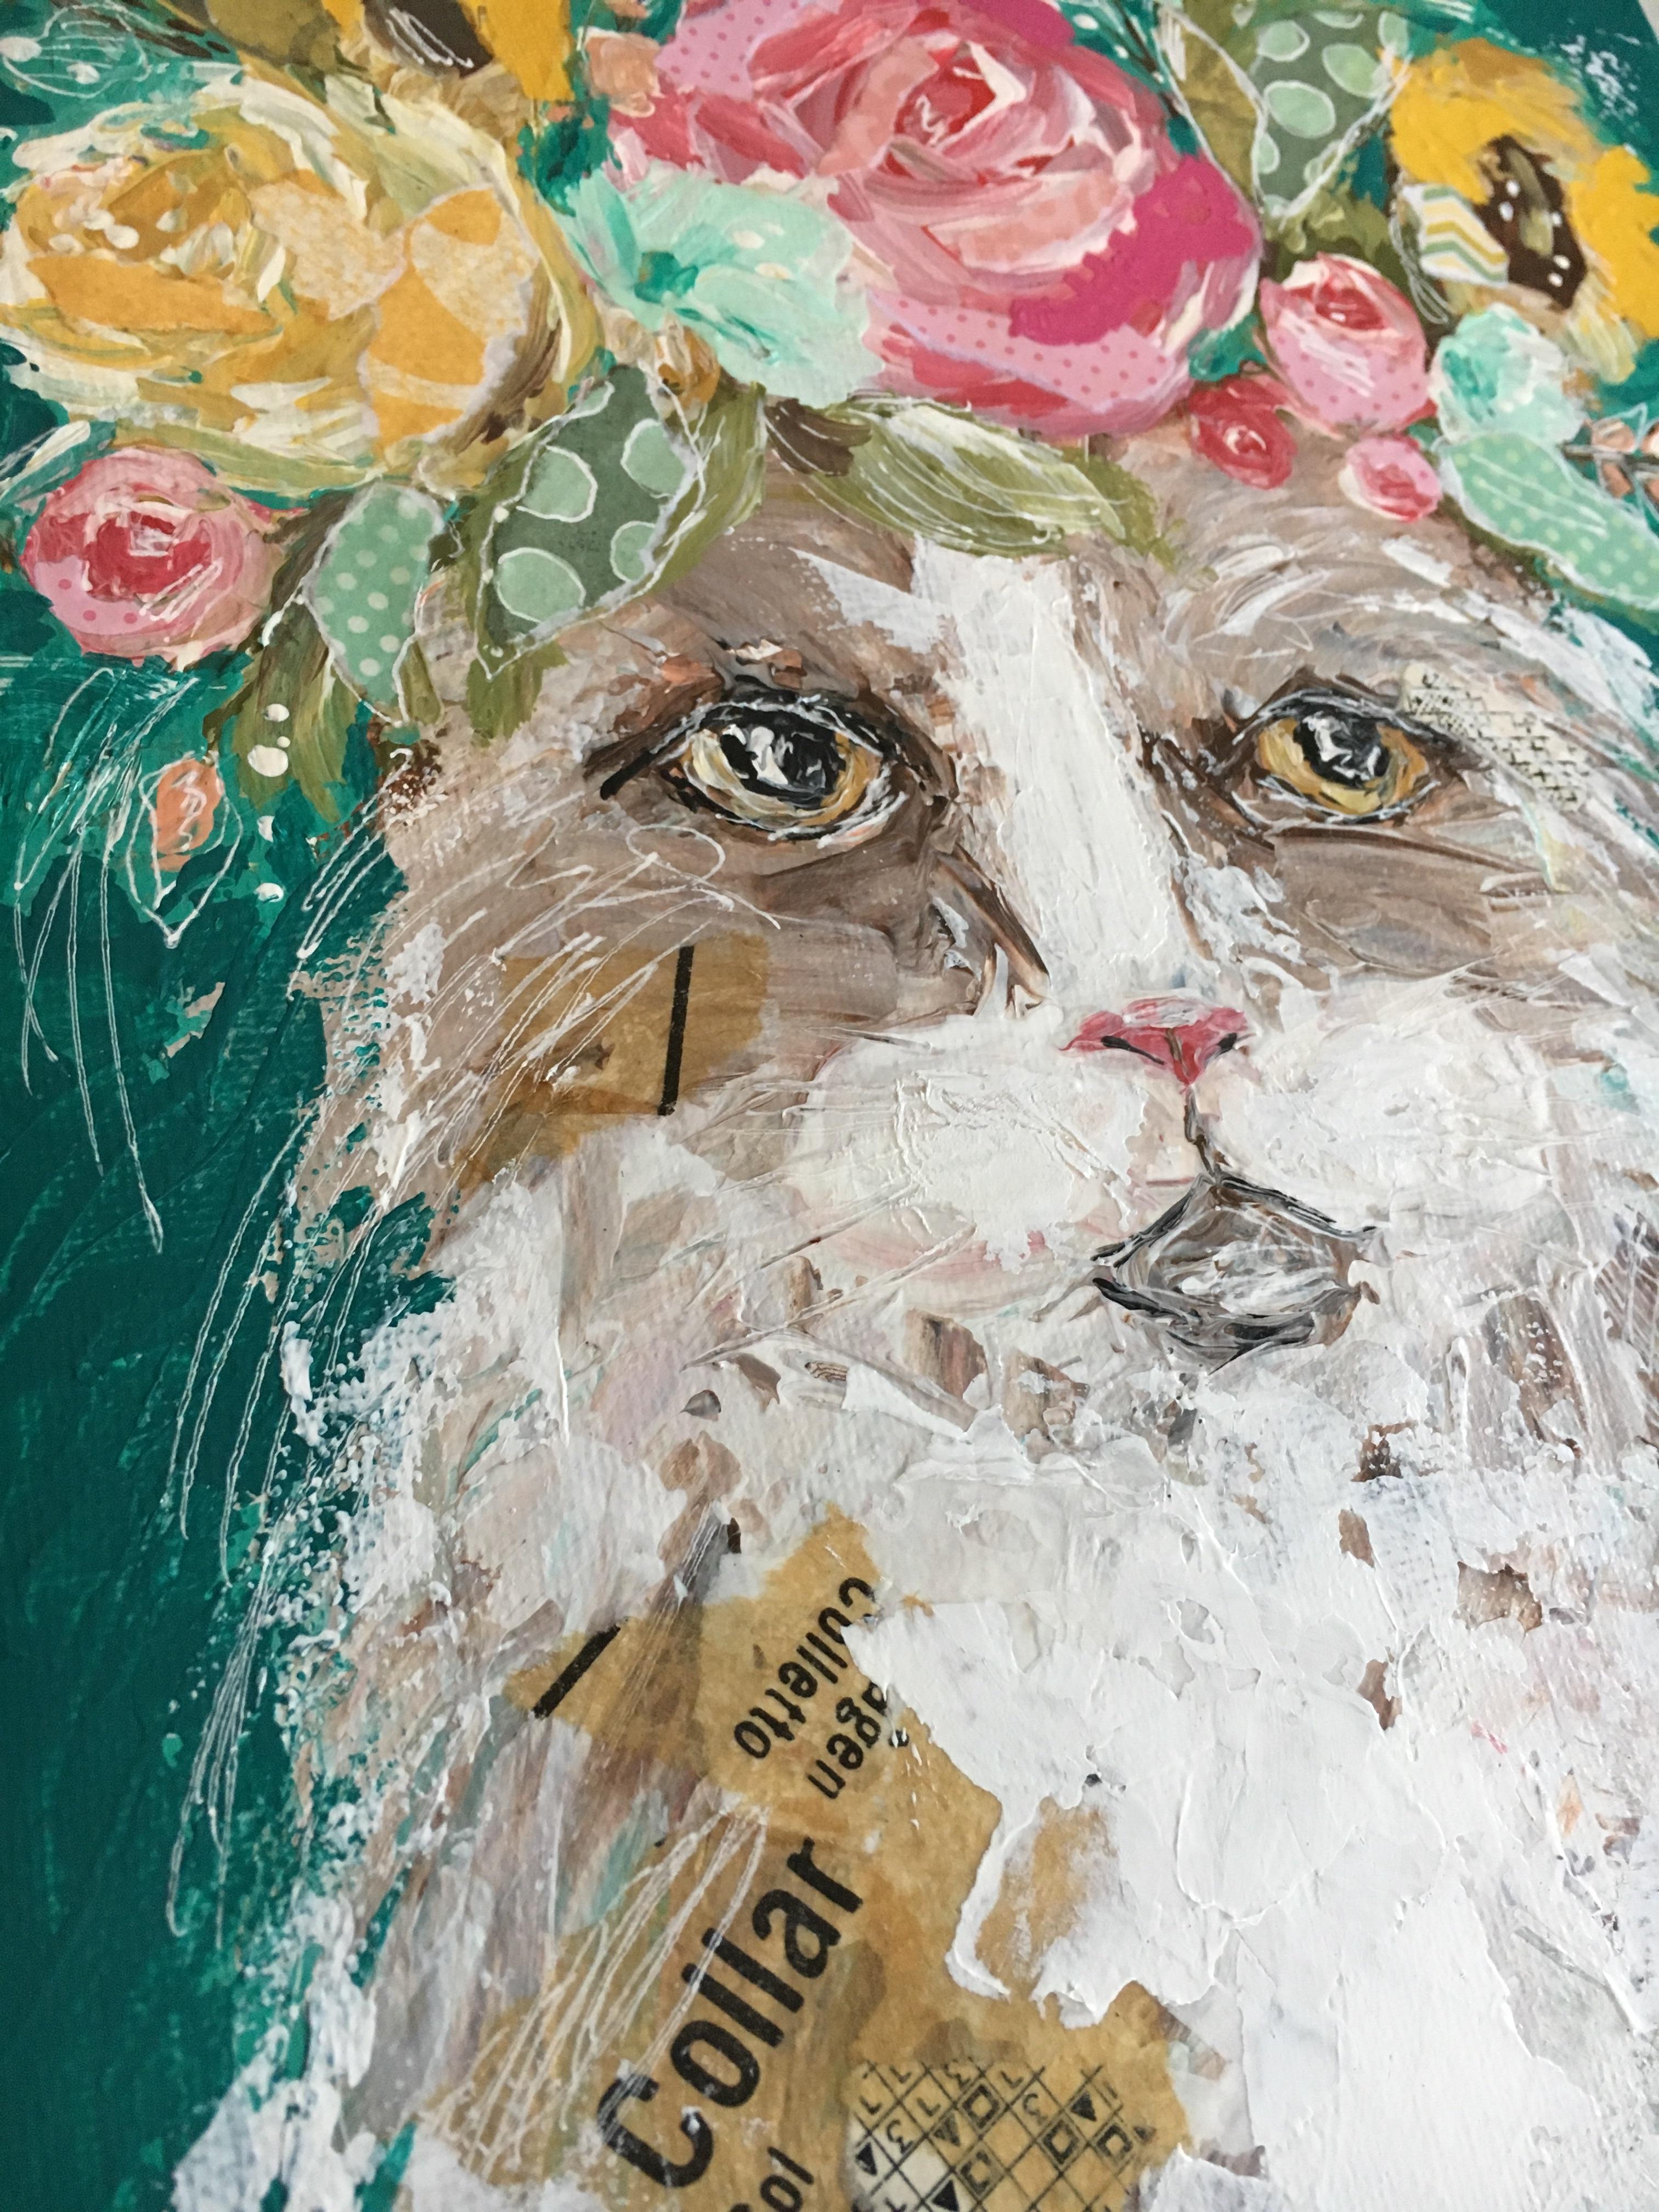 Flora the Cat by Amanda Hilburn